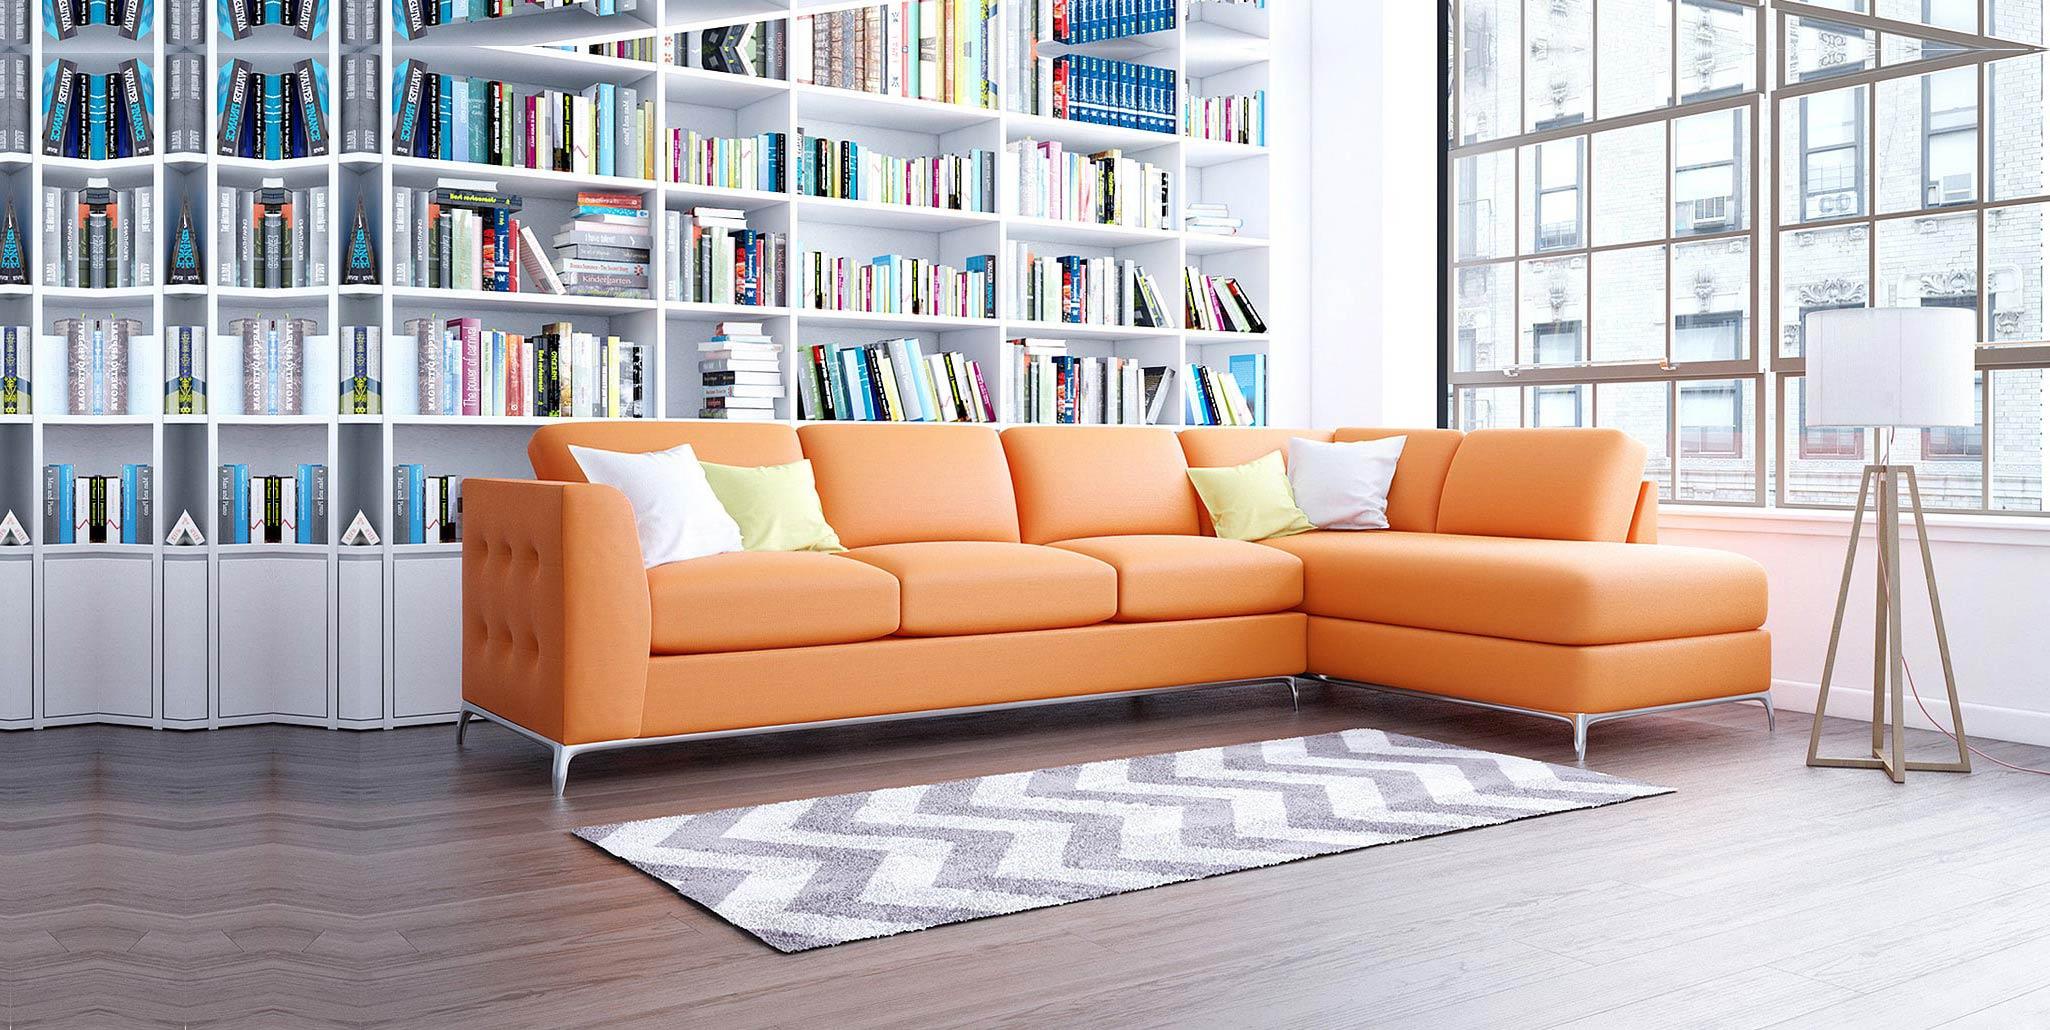 toronto panel furniture gallery 1